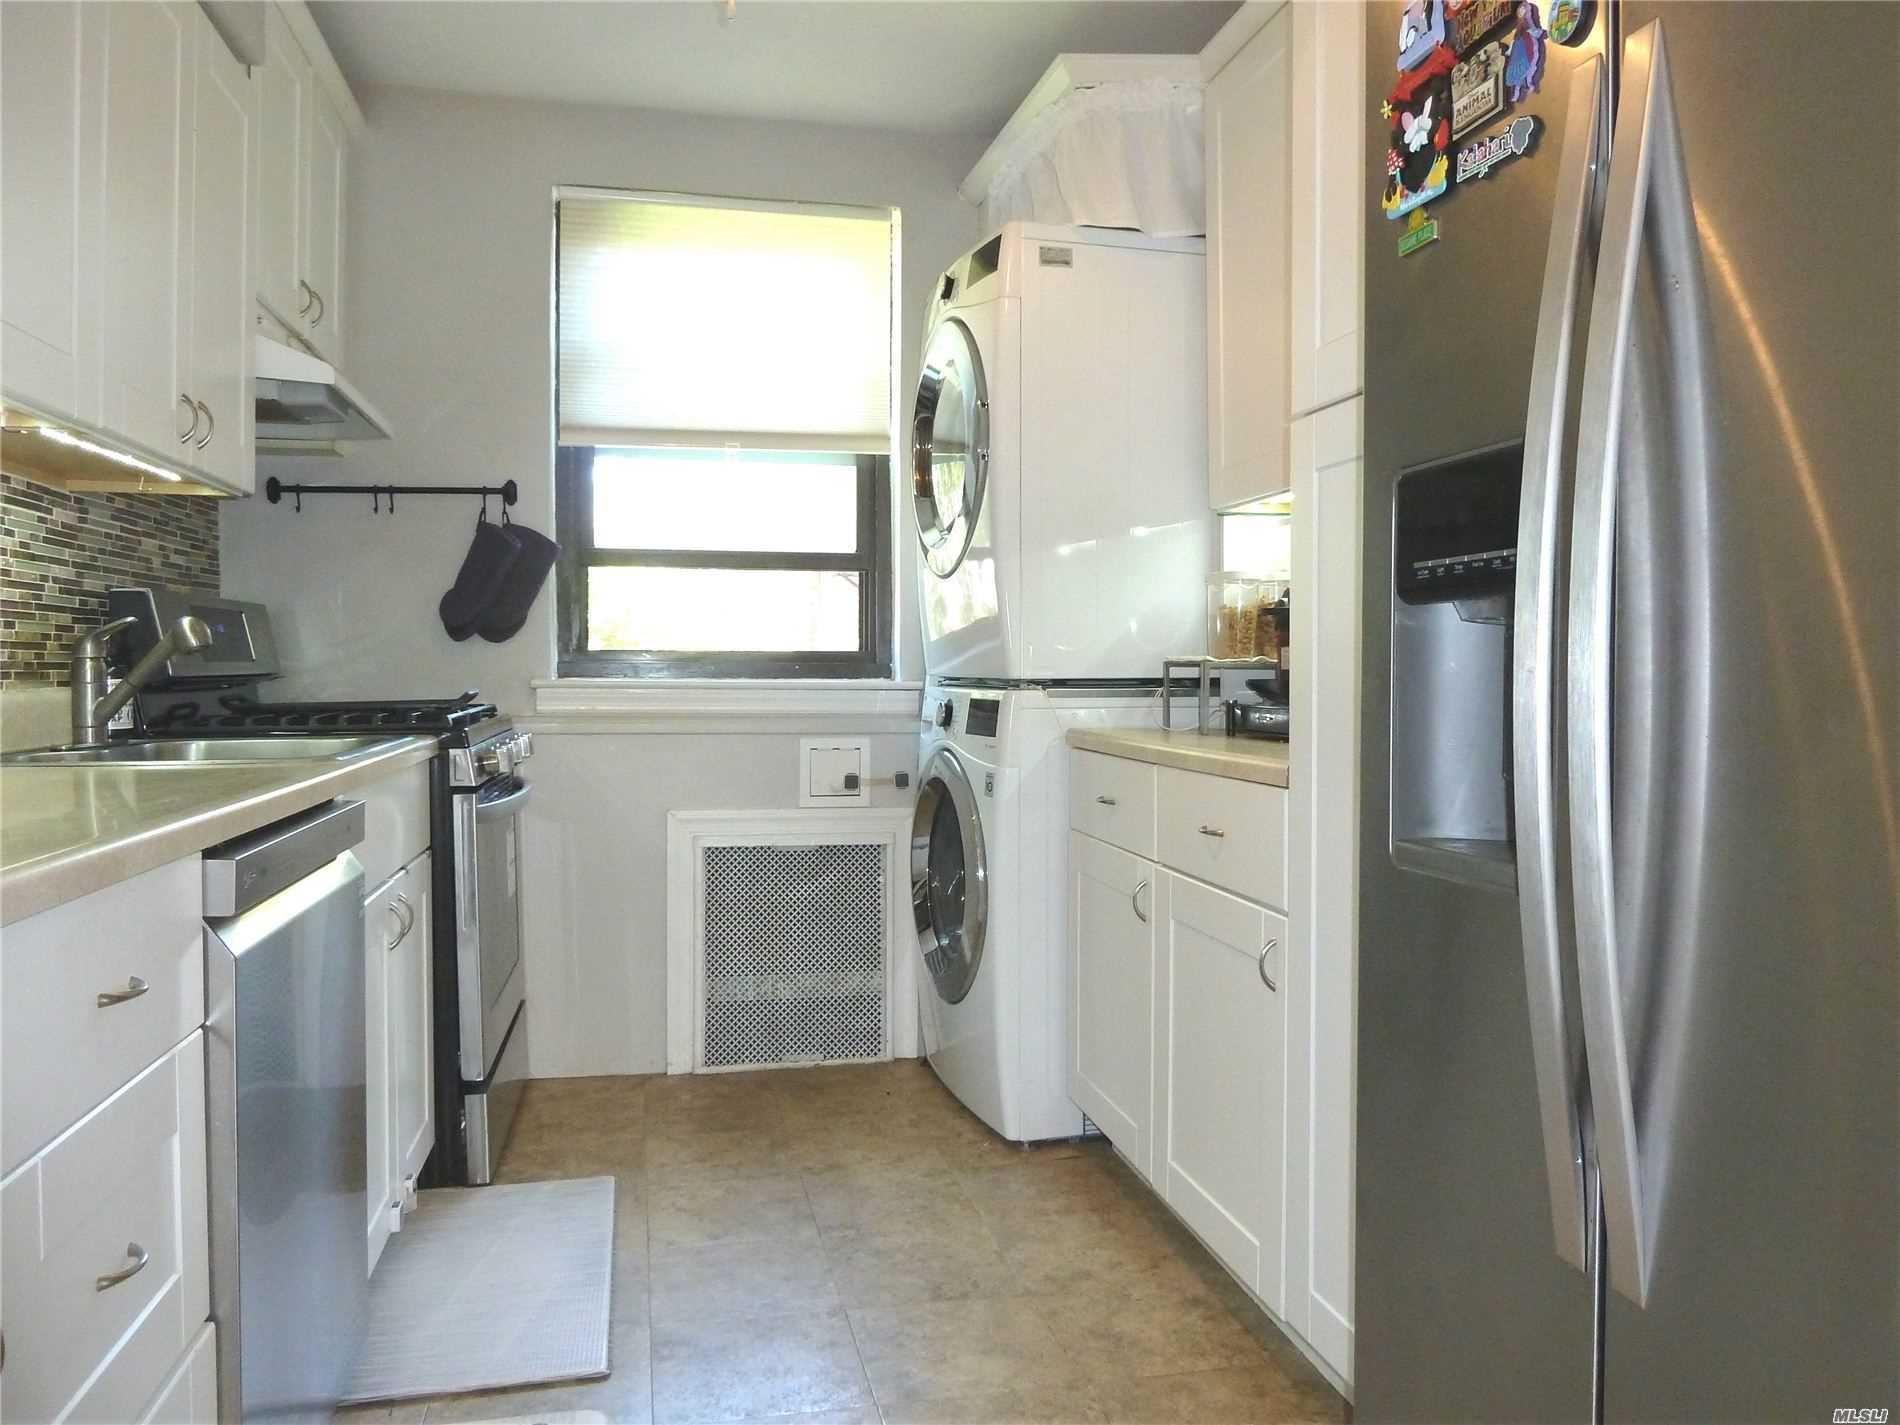 191-15 39 Avenue #170, Flushing, NY 11358 - MLS#: 3239268